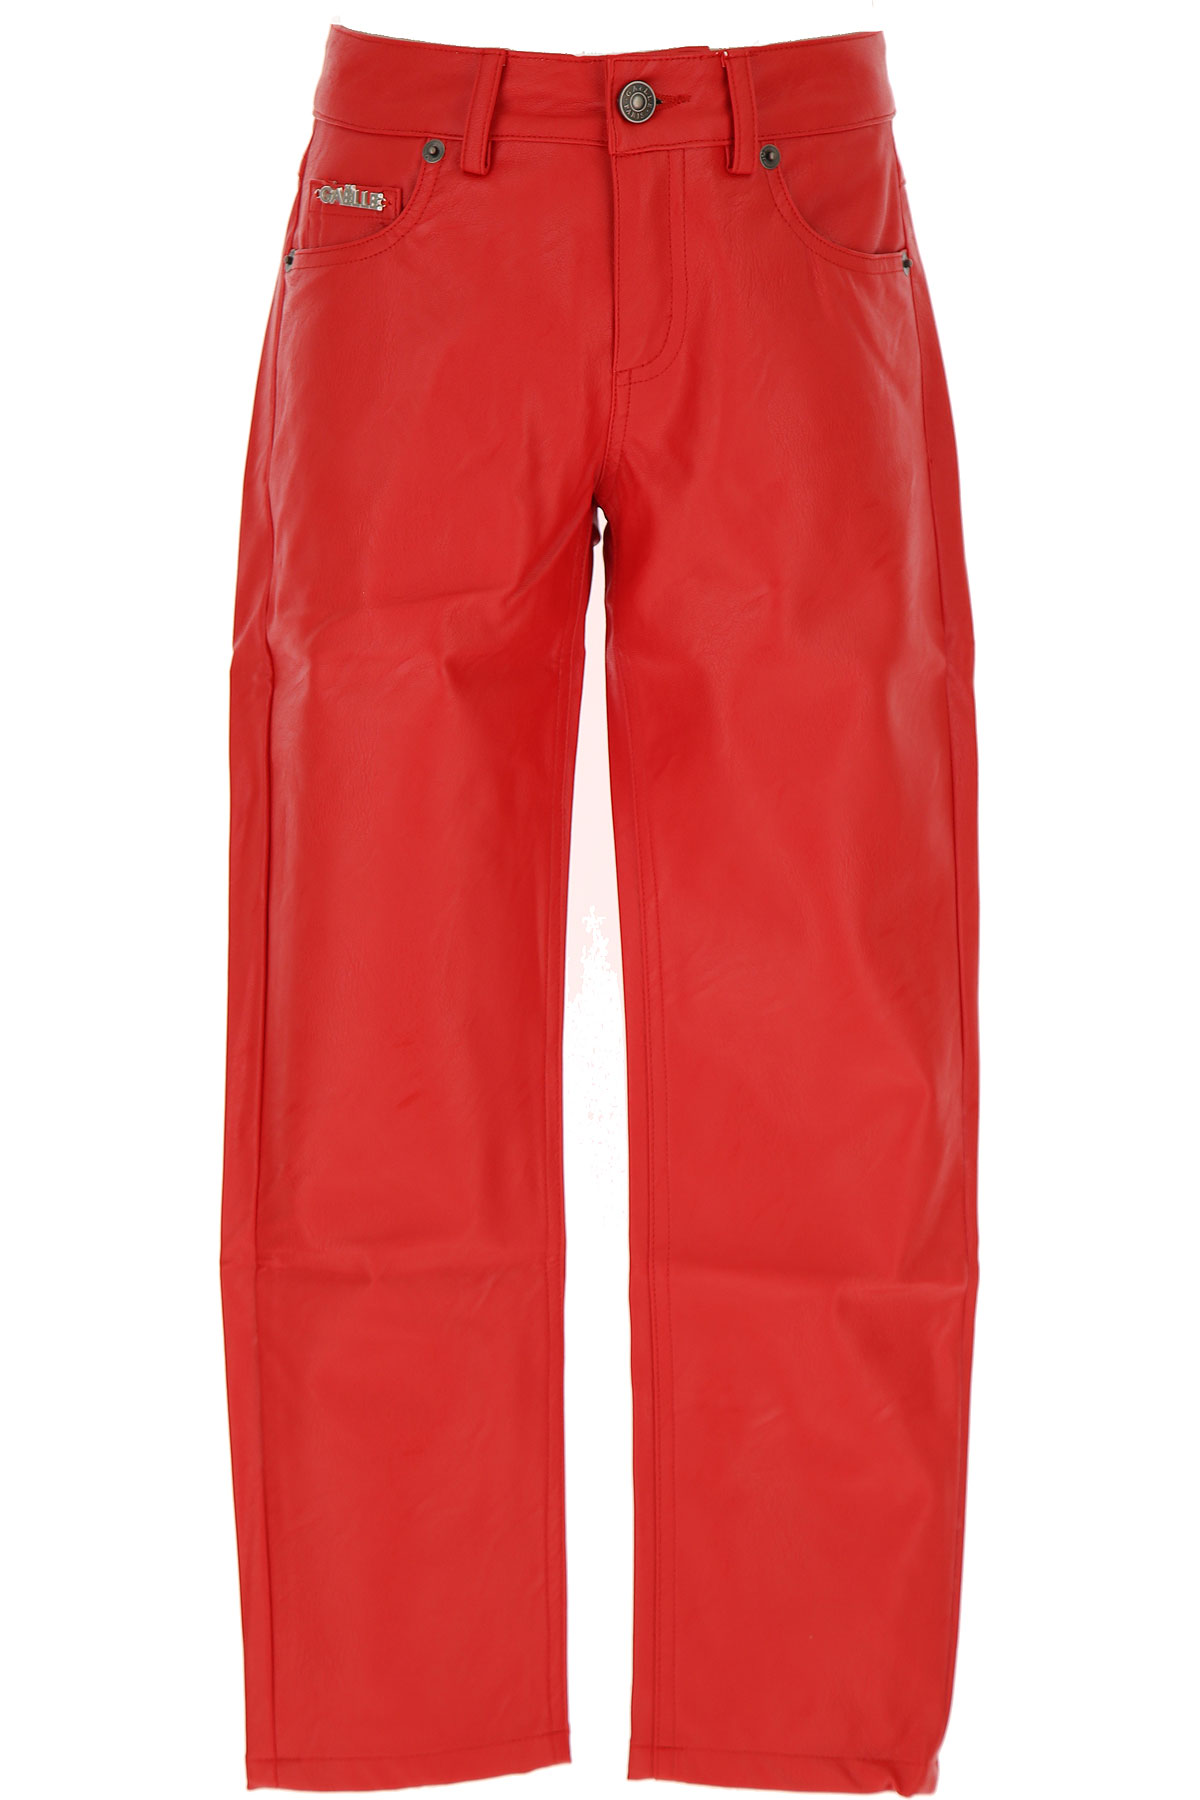 Gaelle Kids Pants for Girls On Sale, Red, polyurethane, 2019, 10Y 12Y 14Y 8Y